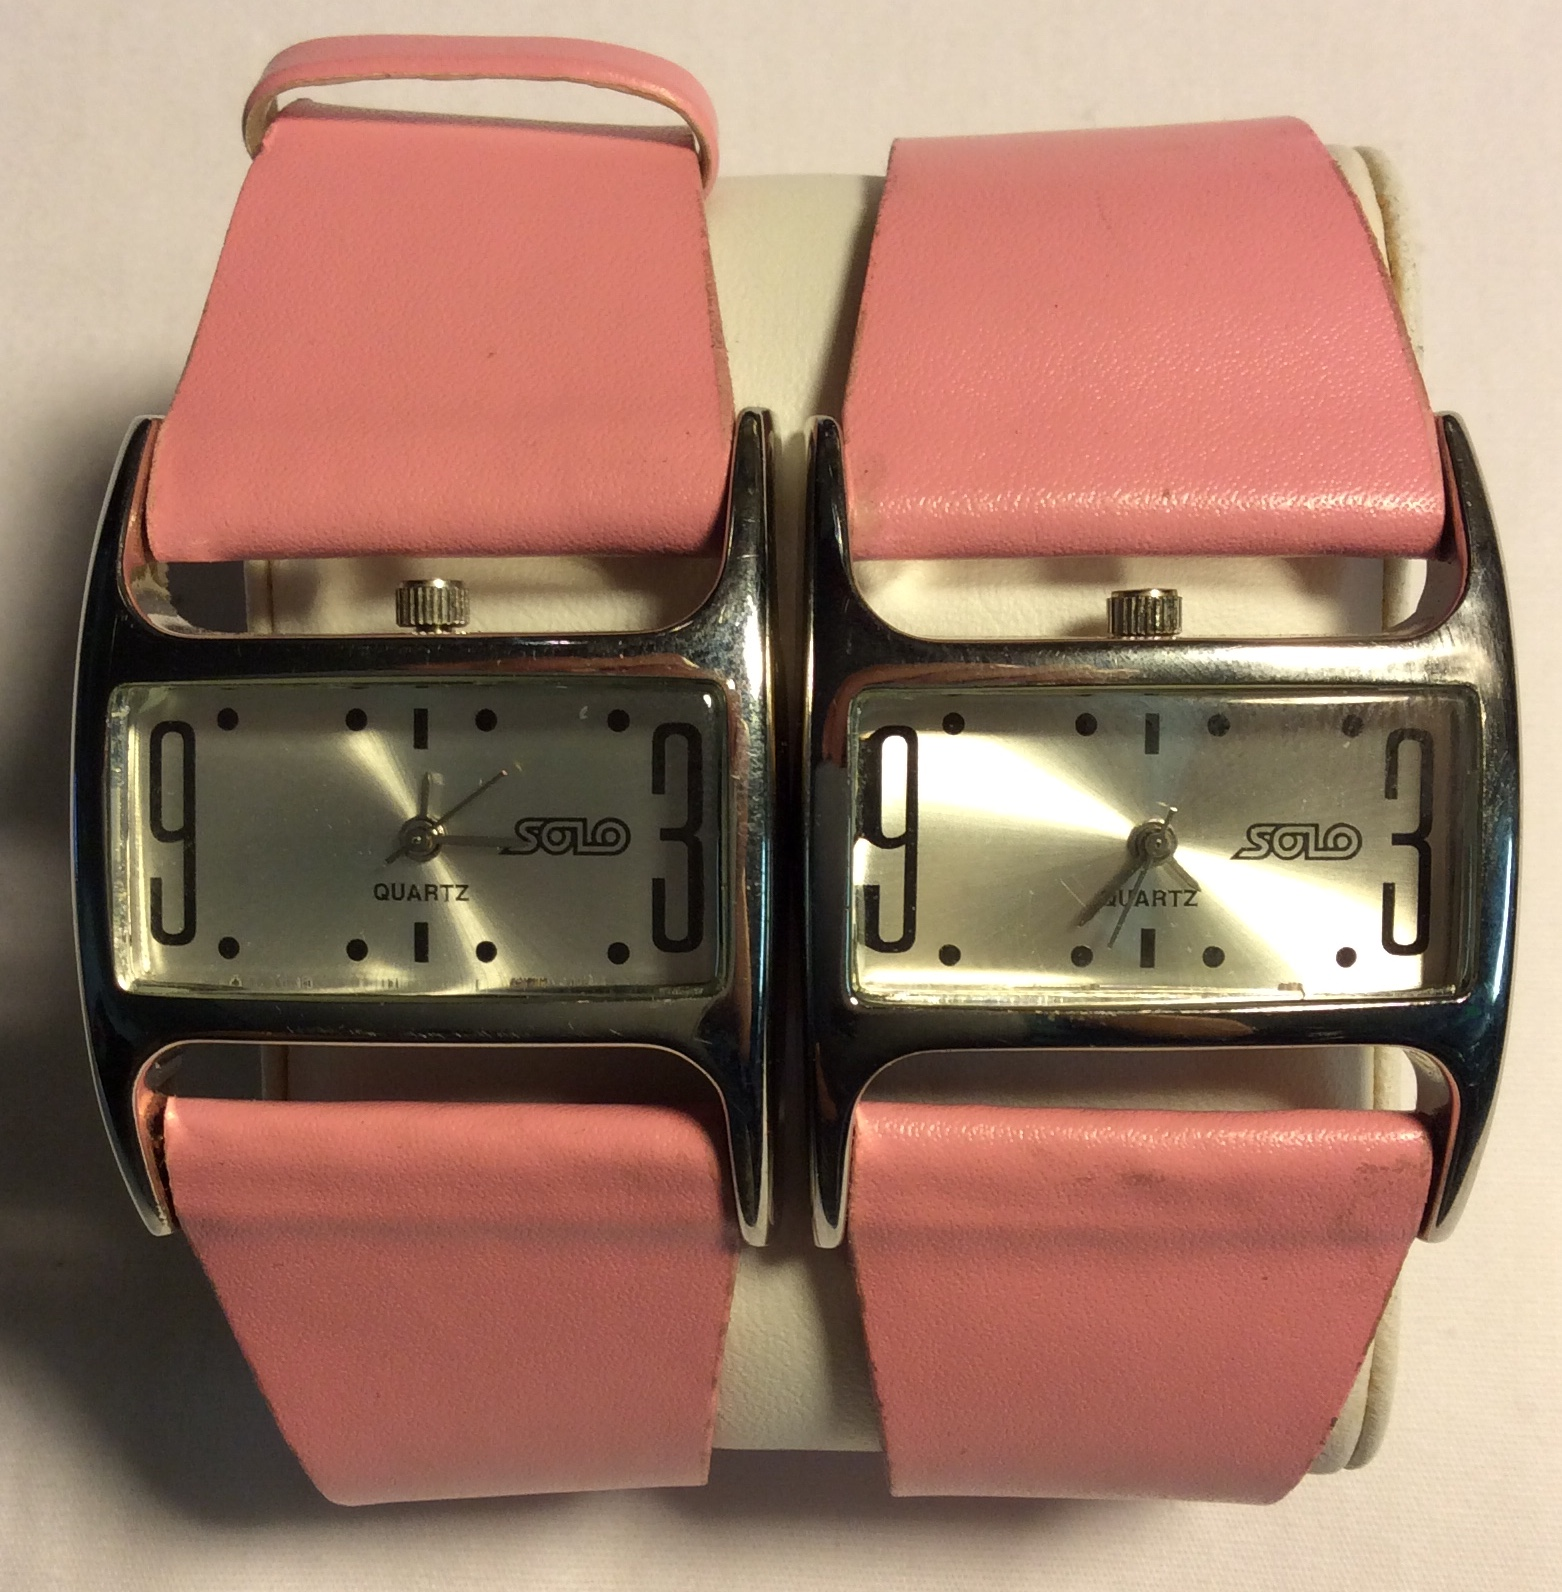 Solo watch- rectangular silver face